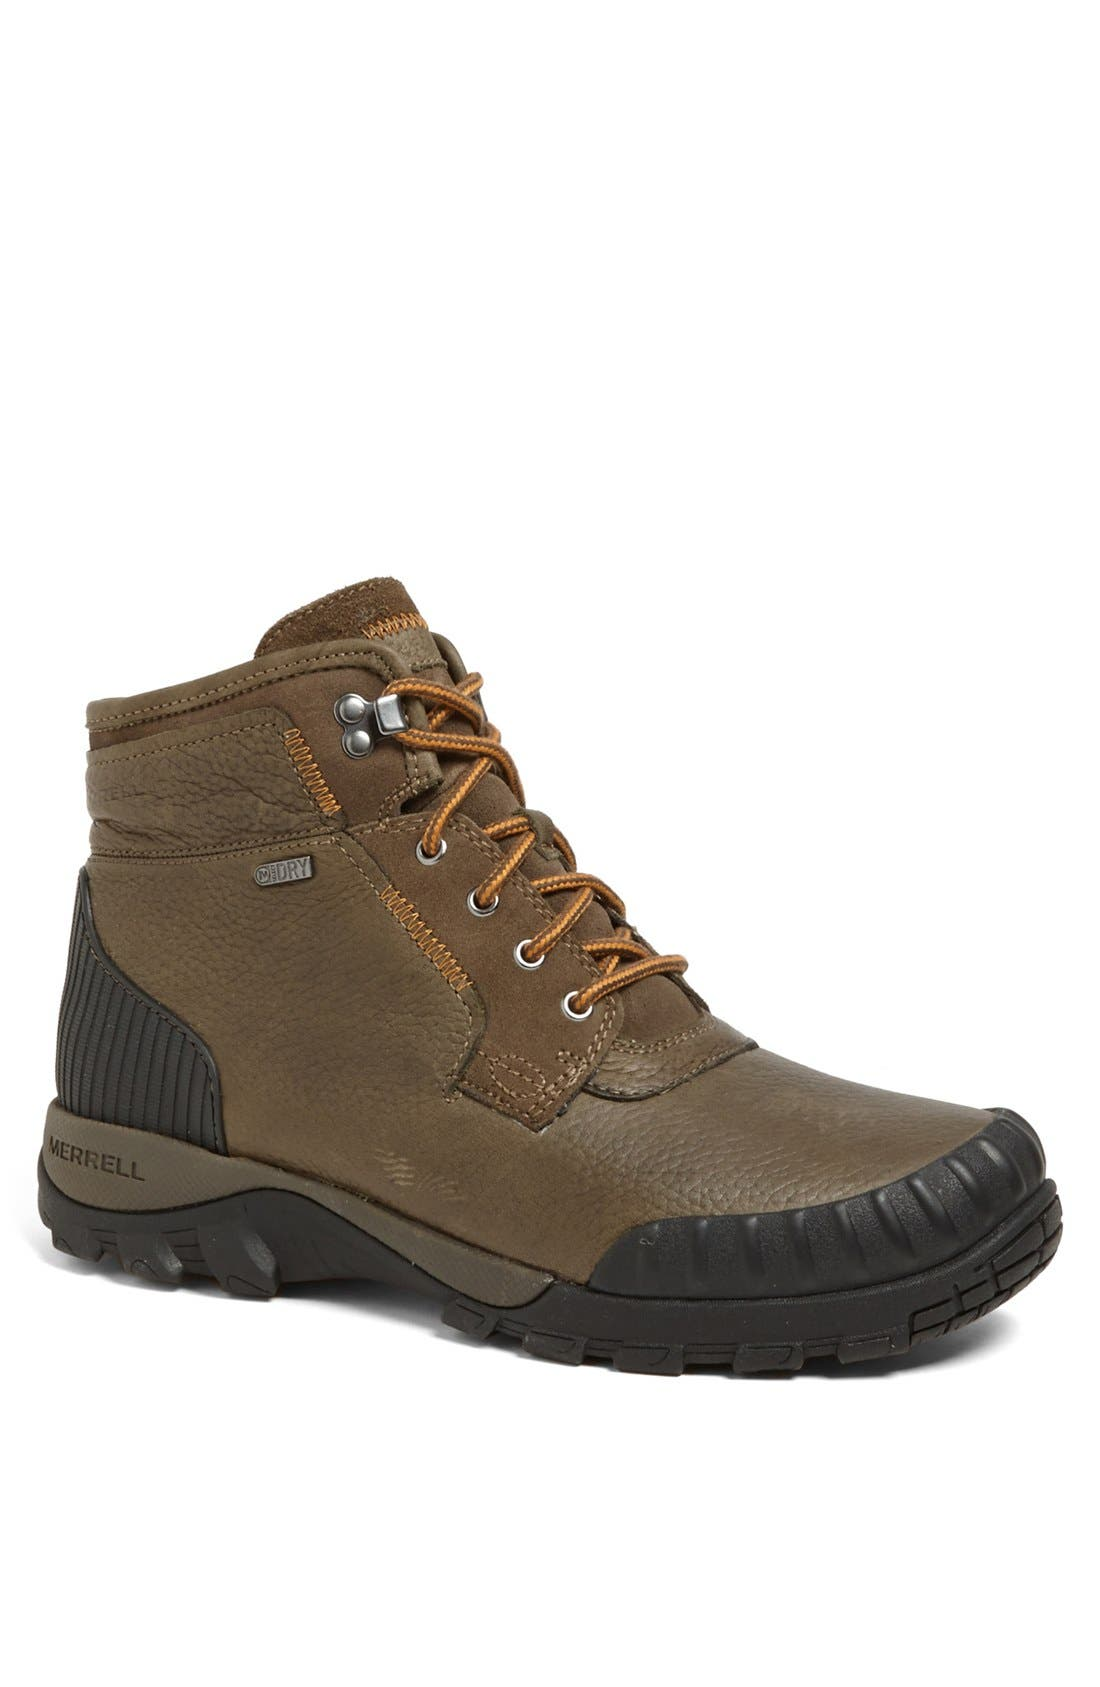 Alternate Image 1 Selected - Merrell 'Himavat' Waterproof Chukka Boot